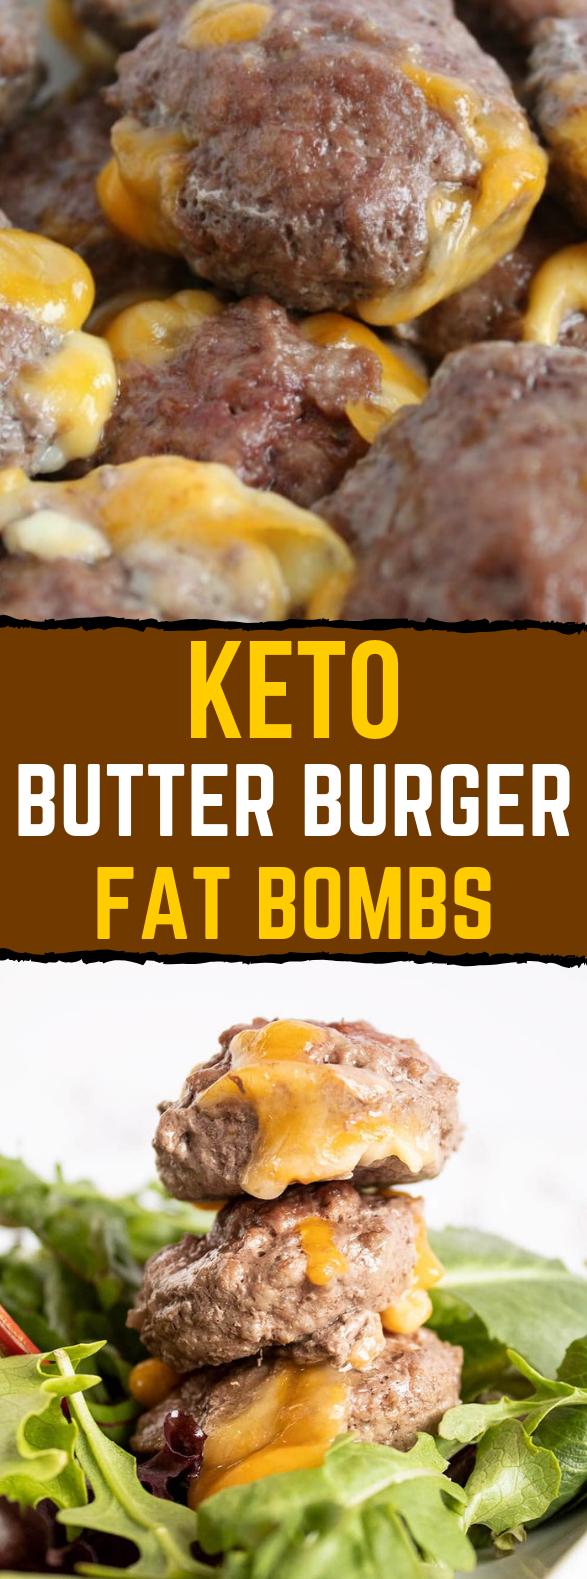 Keto Butter Burgers (Savory Fat Bomb) #ketogenicrecipe #zerocarb